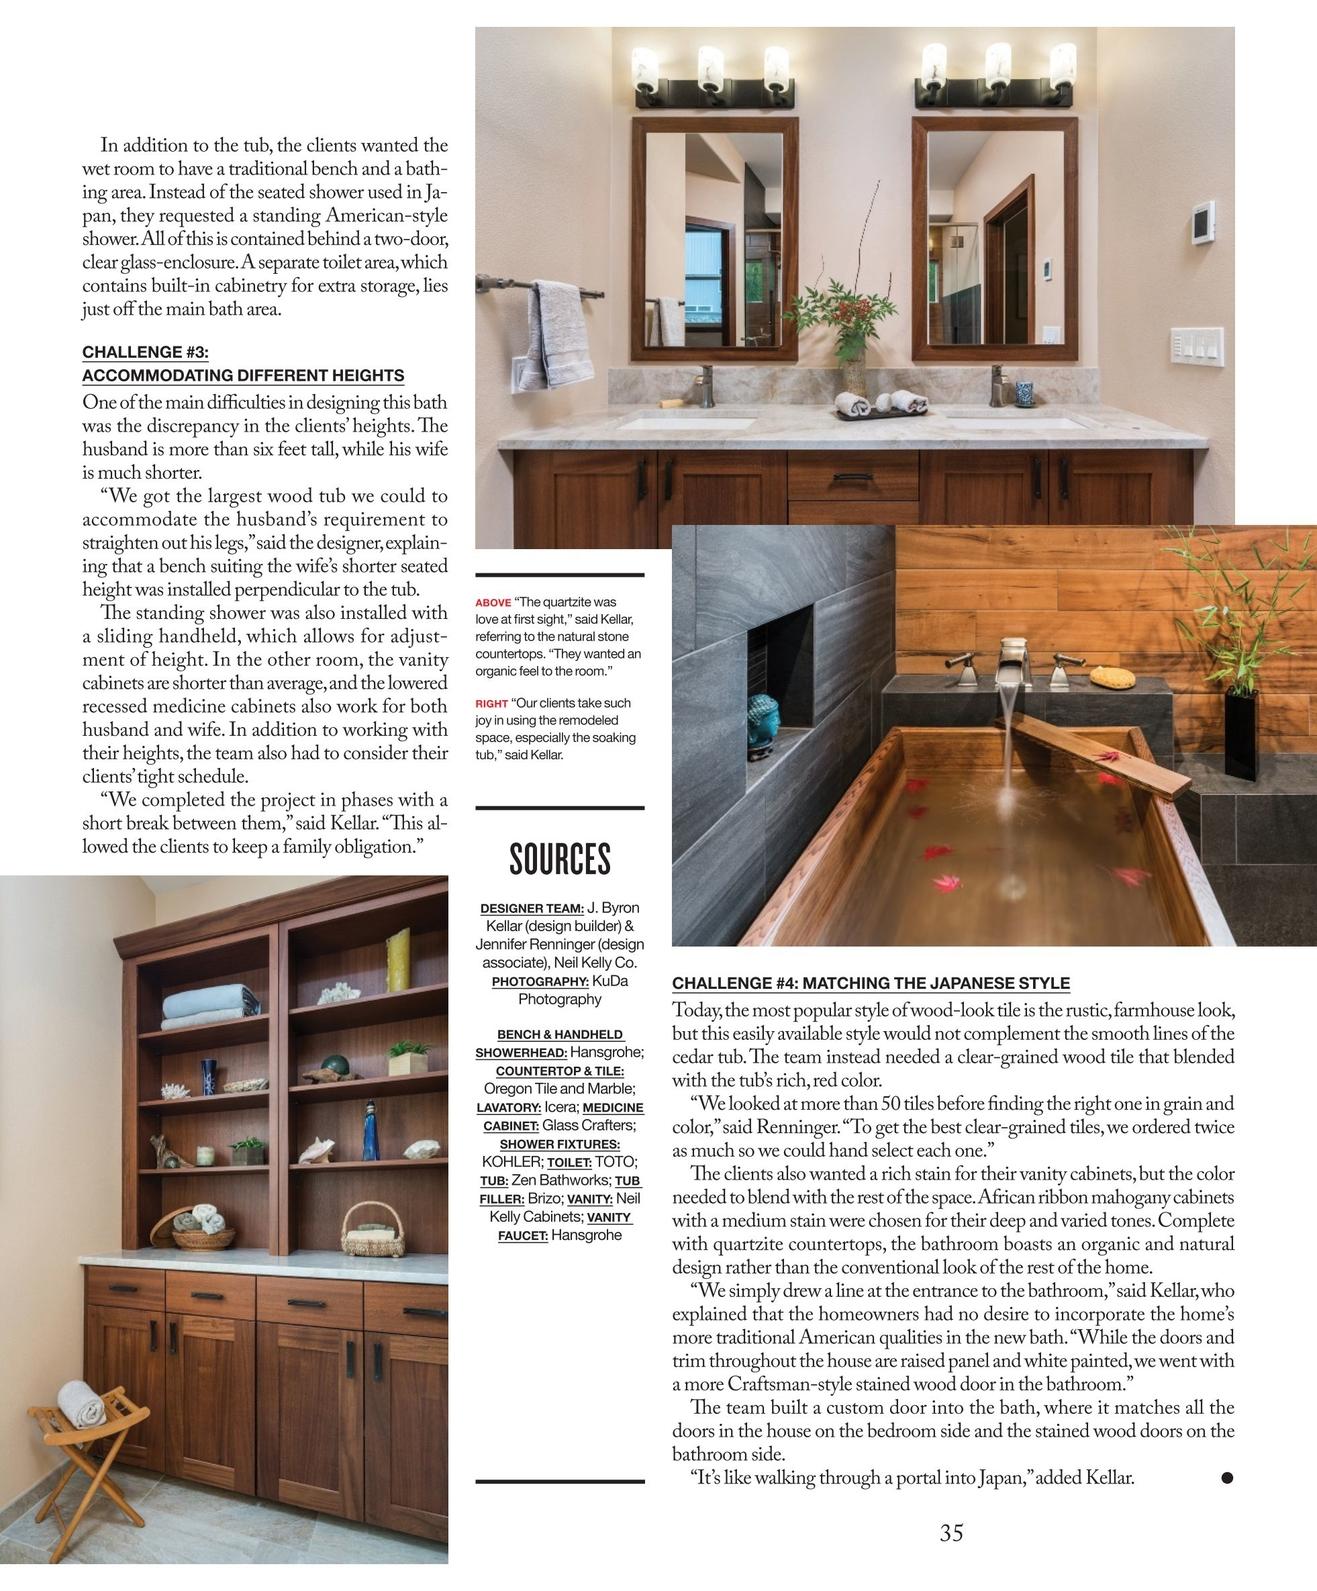 Wondrous Kitchen Bath Business May June 2018 Download Free Architecture Designs Scobabritishbridgeorg